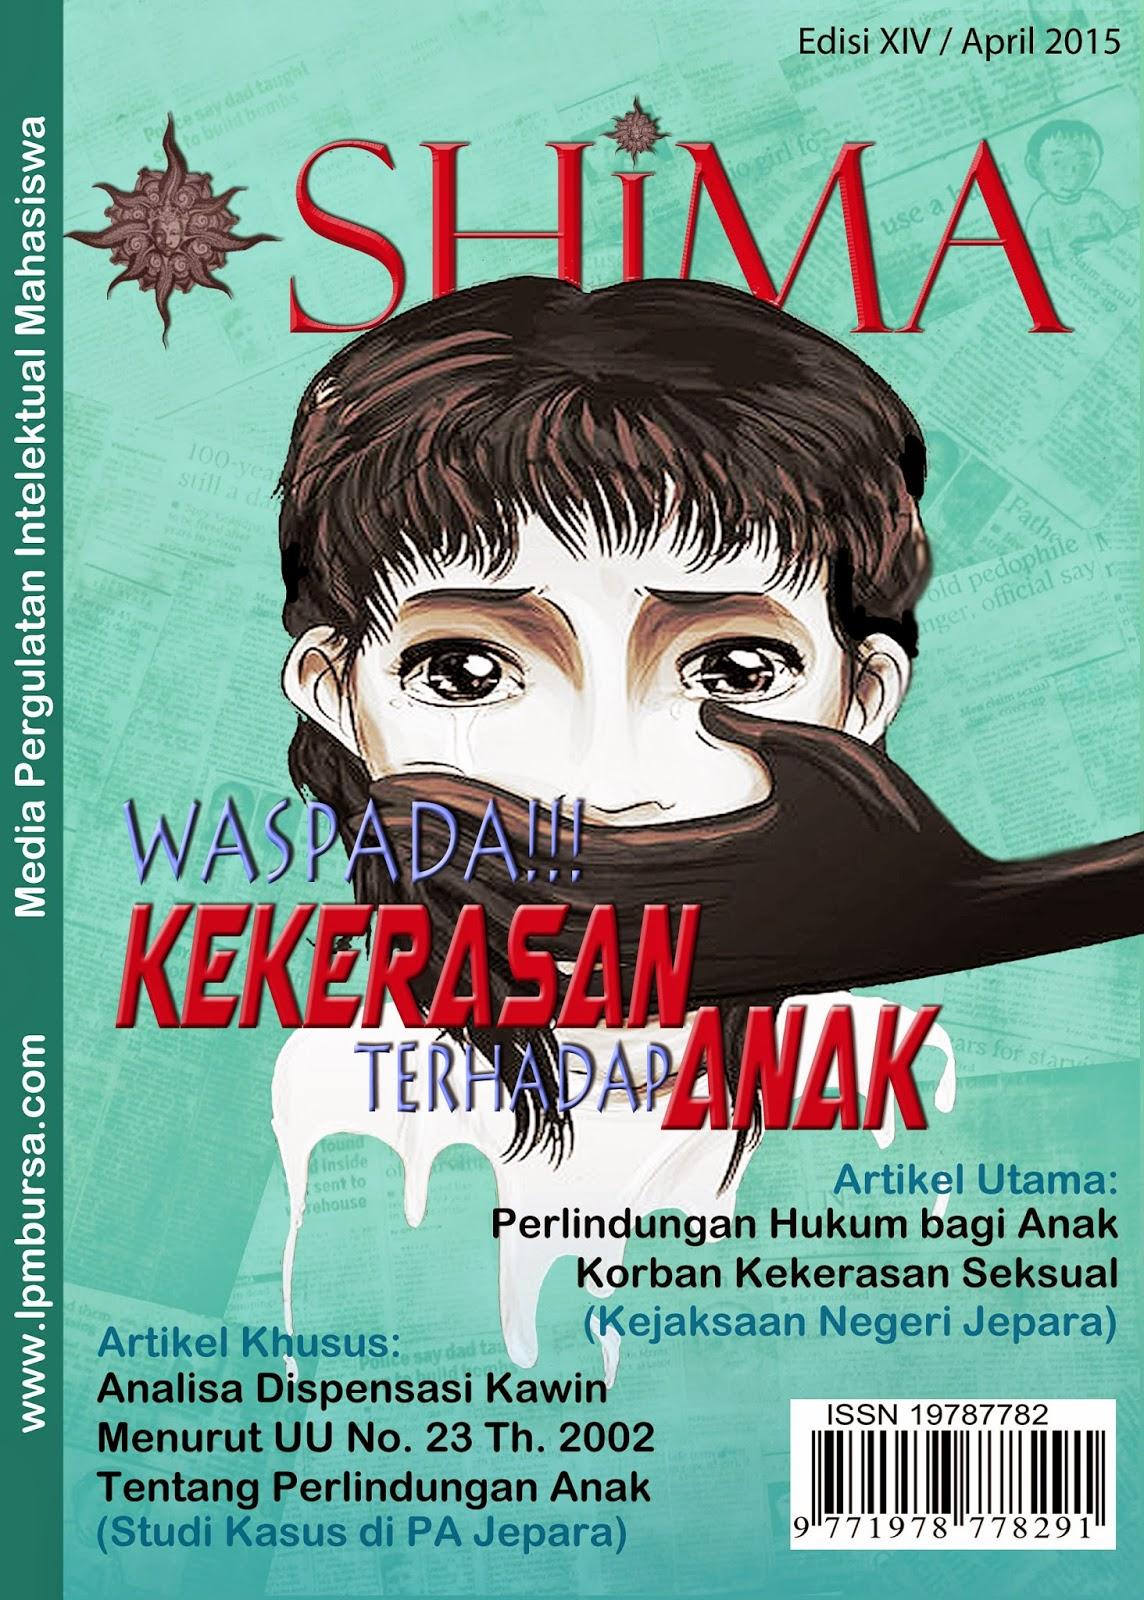 Majalah SHIMA edisi 14, UNISNU, Launching Majalah